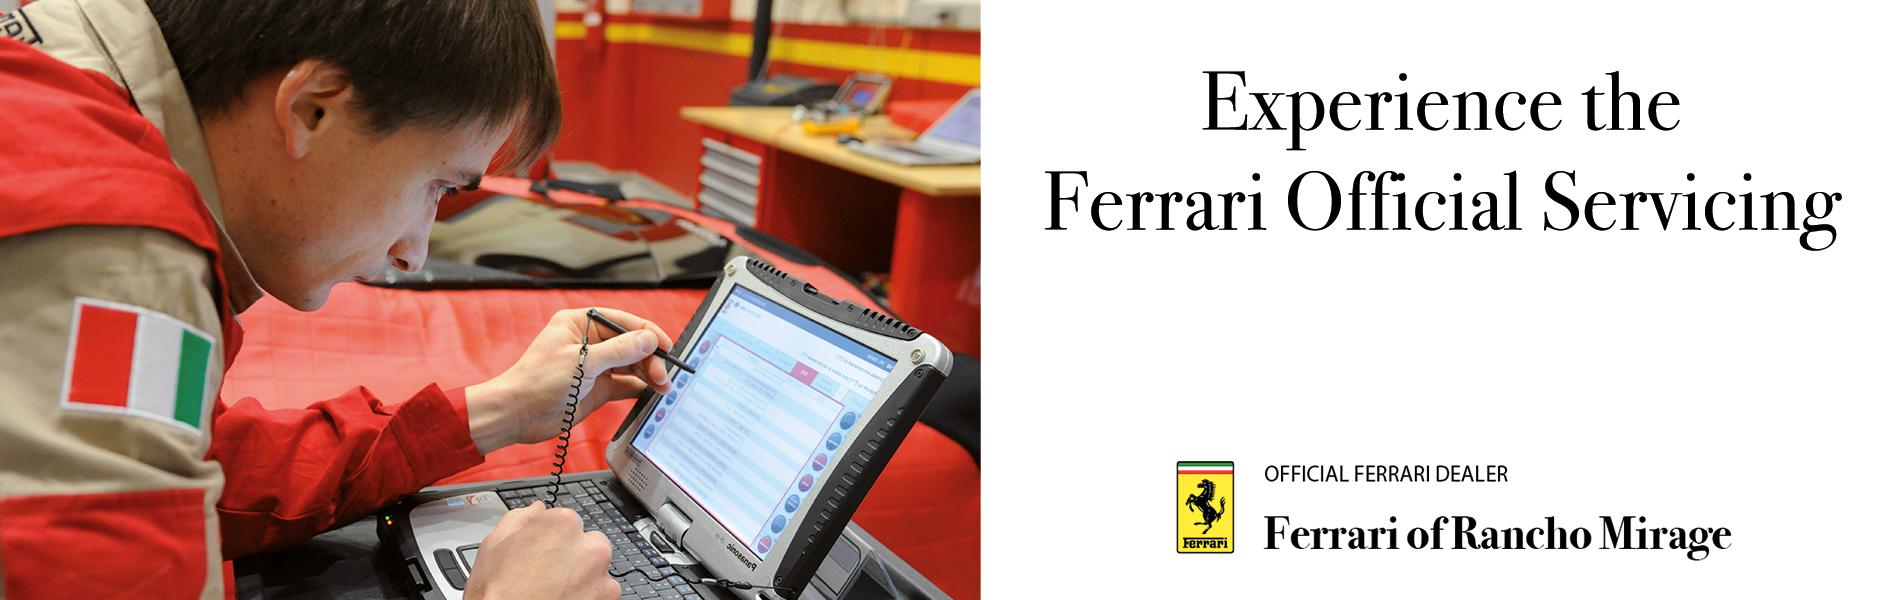 Ferrari fall service desktop v2.1